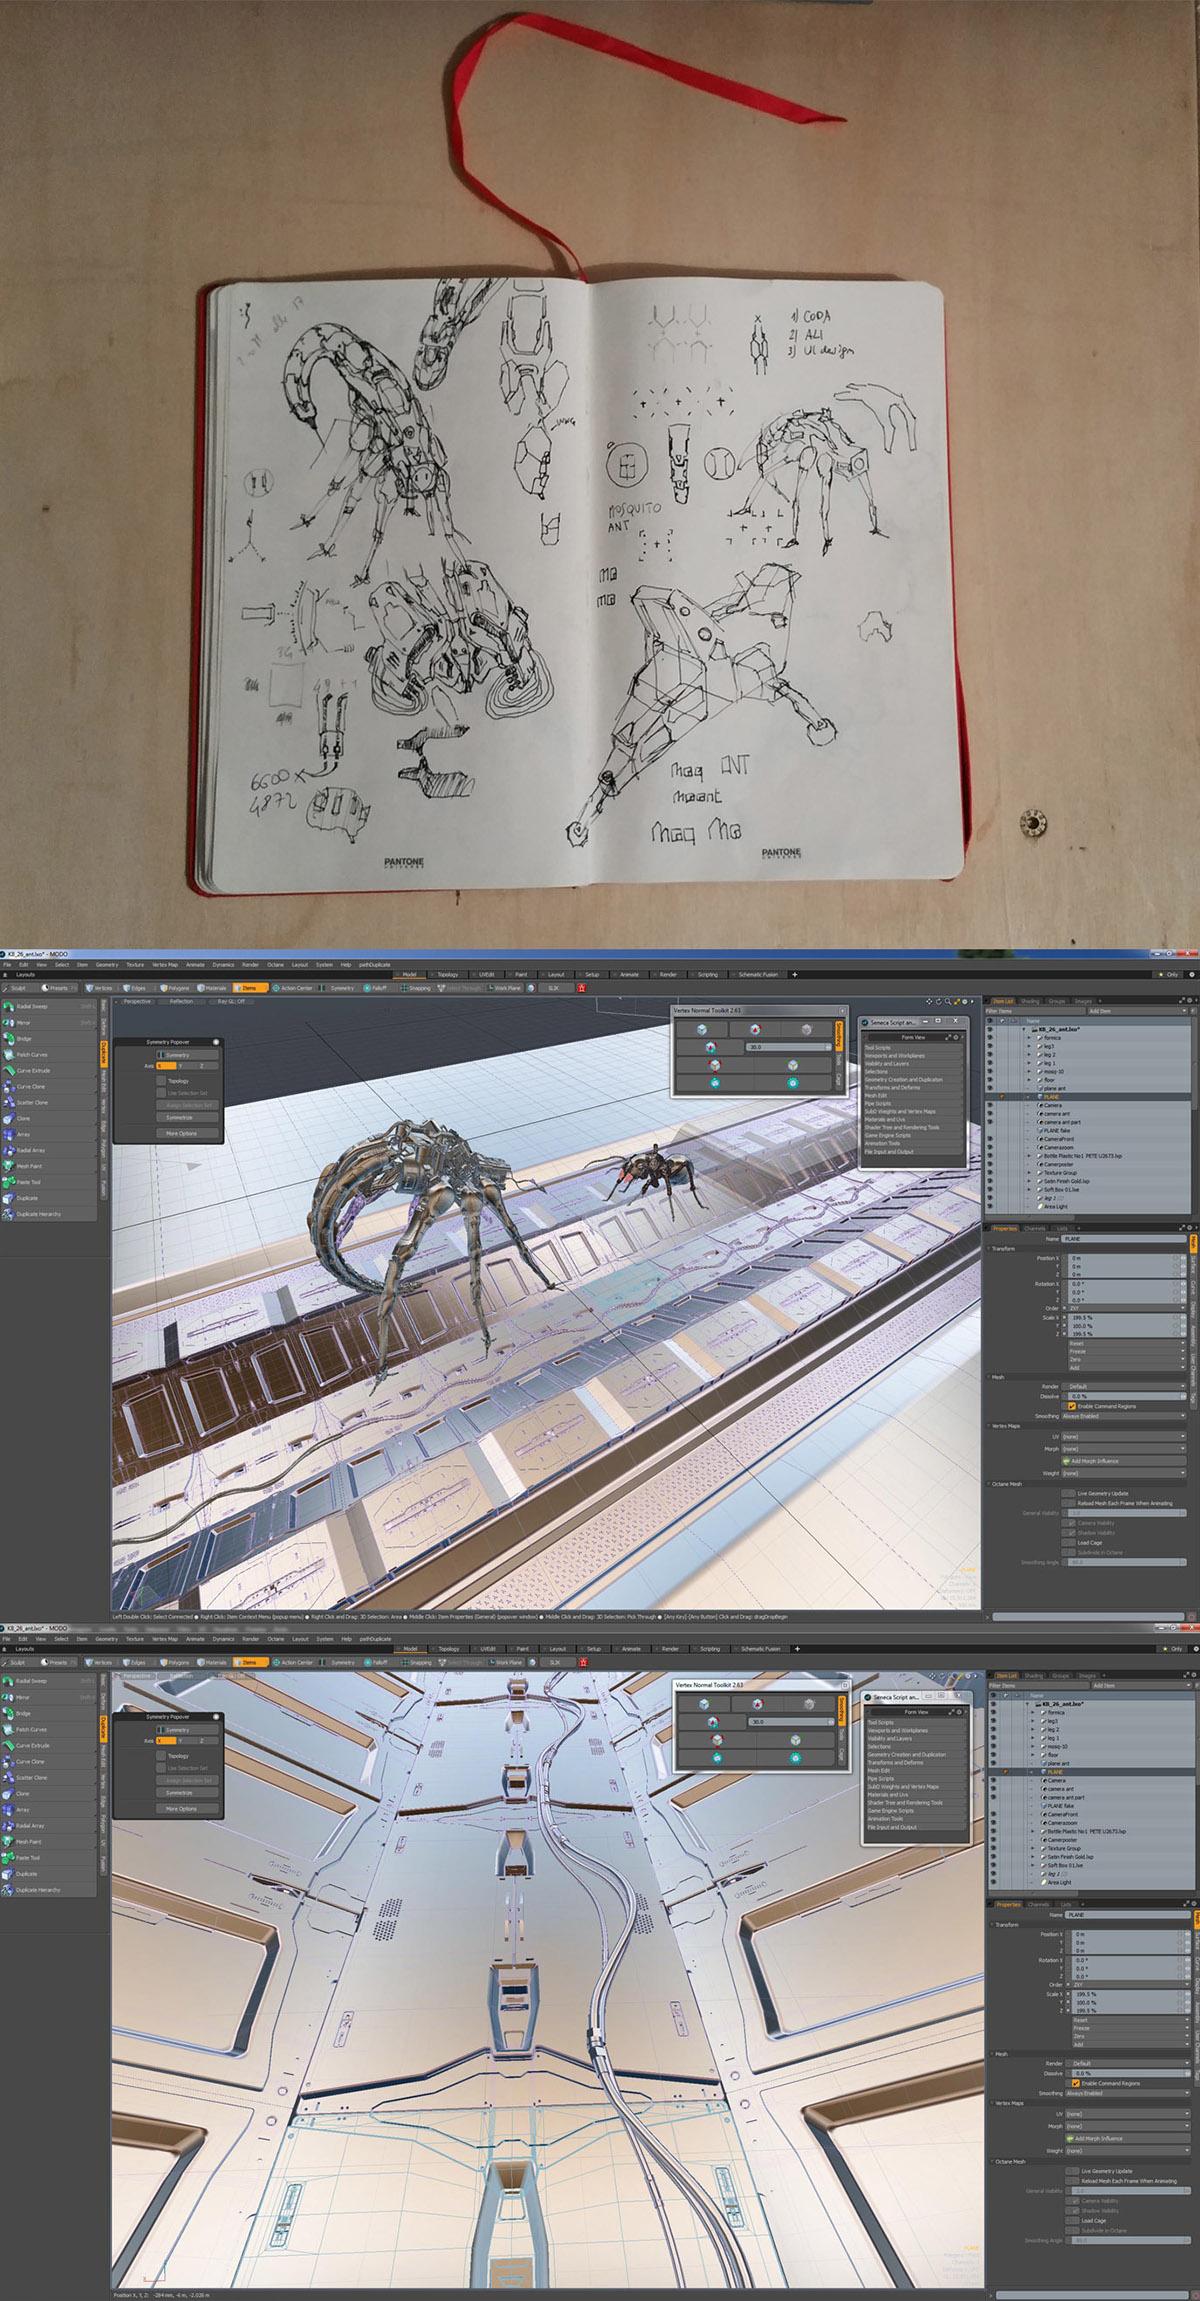 mosquito ant Scifi Nature UI HUD Interface creature corridor 3D CGI robotic mecha biomechanical